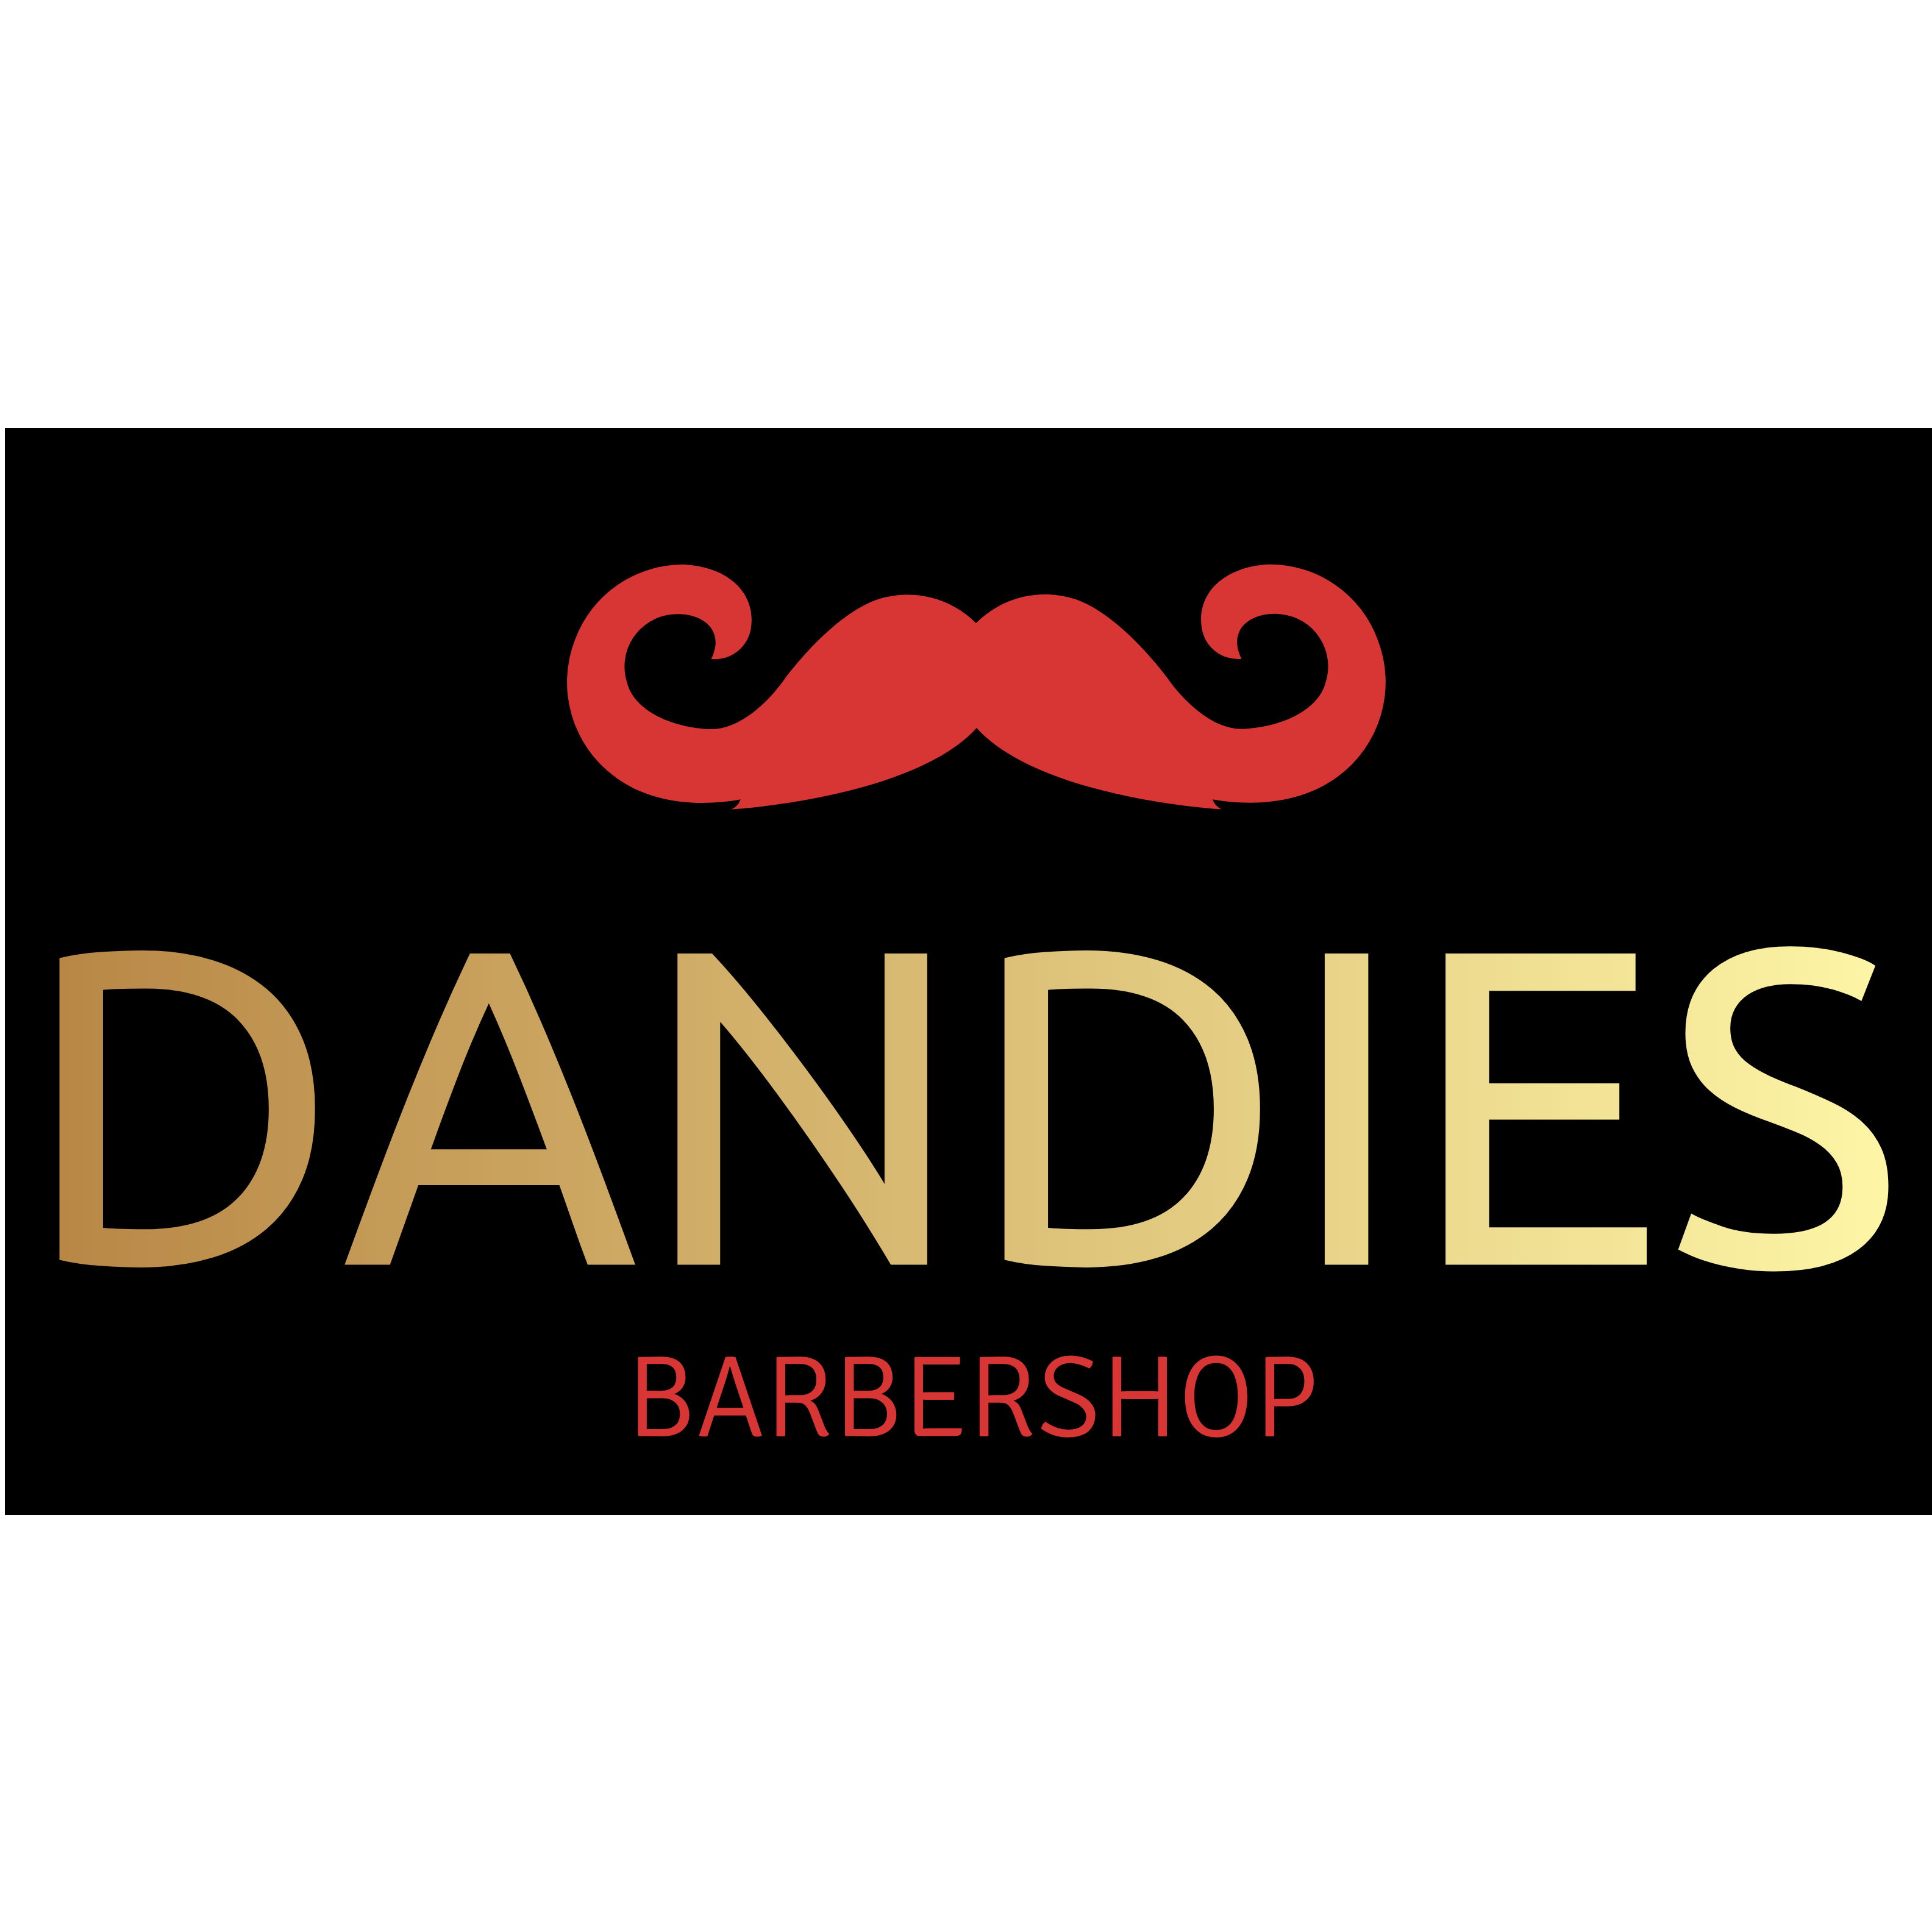 Dandies Barber and Beard Stylist Mountain View